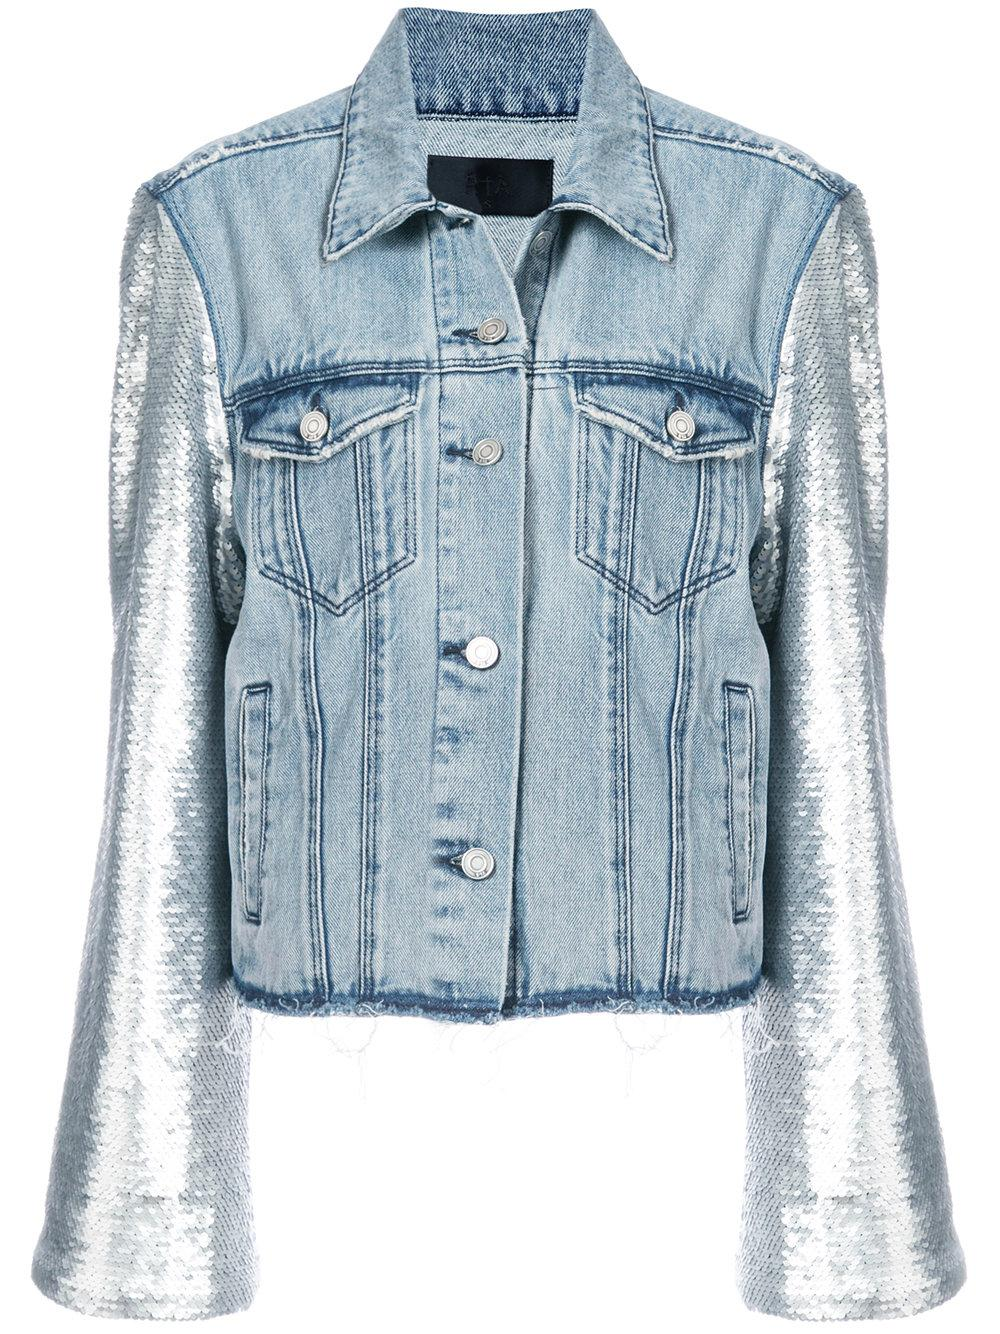 Rta Light Blue Sequined Sleeves Denim Jacket